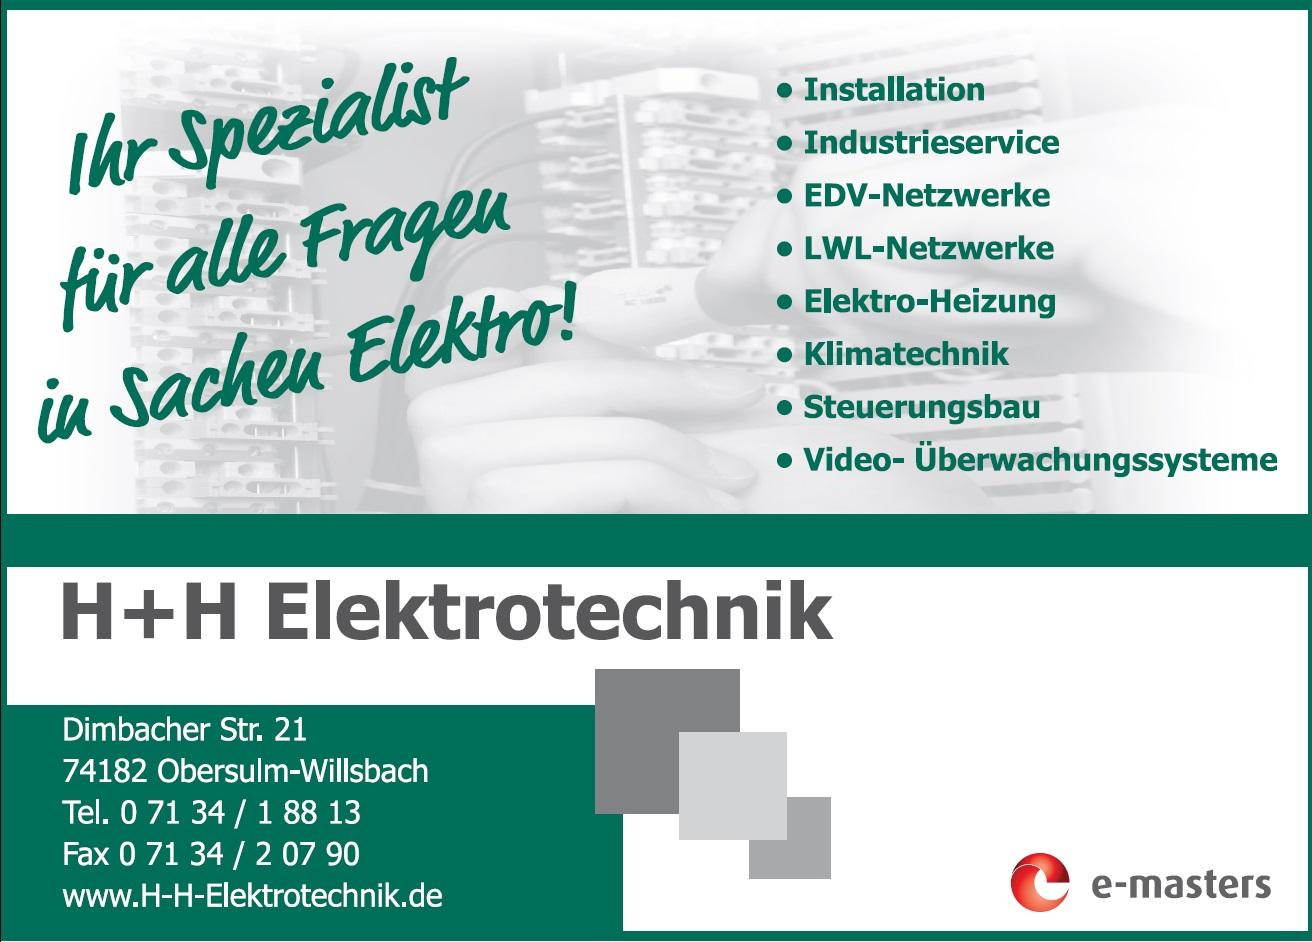 H+H-Elektrotechnik OHG